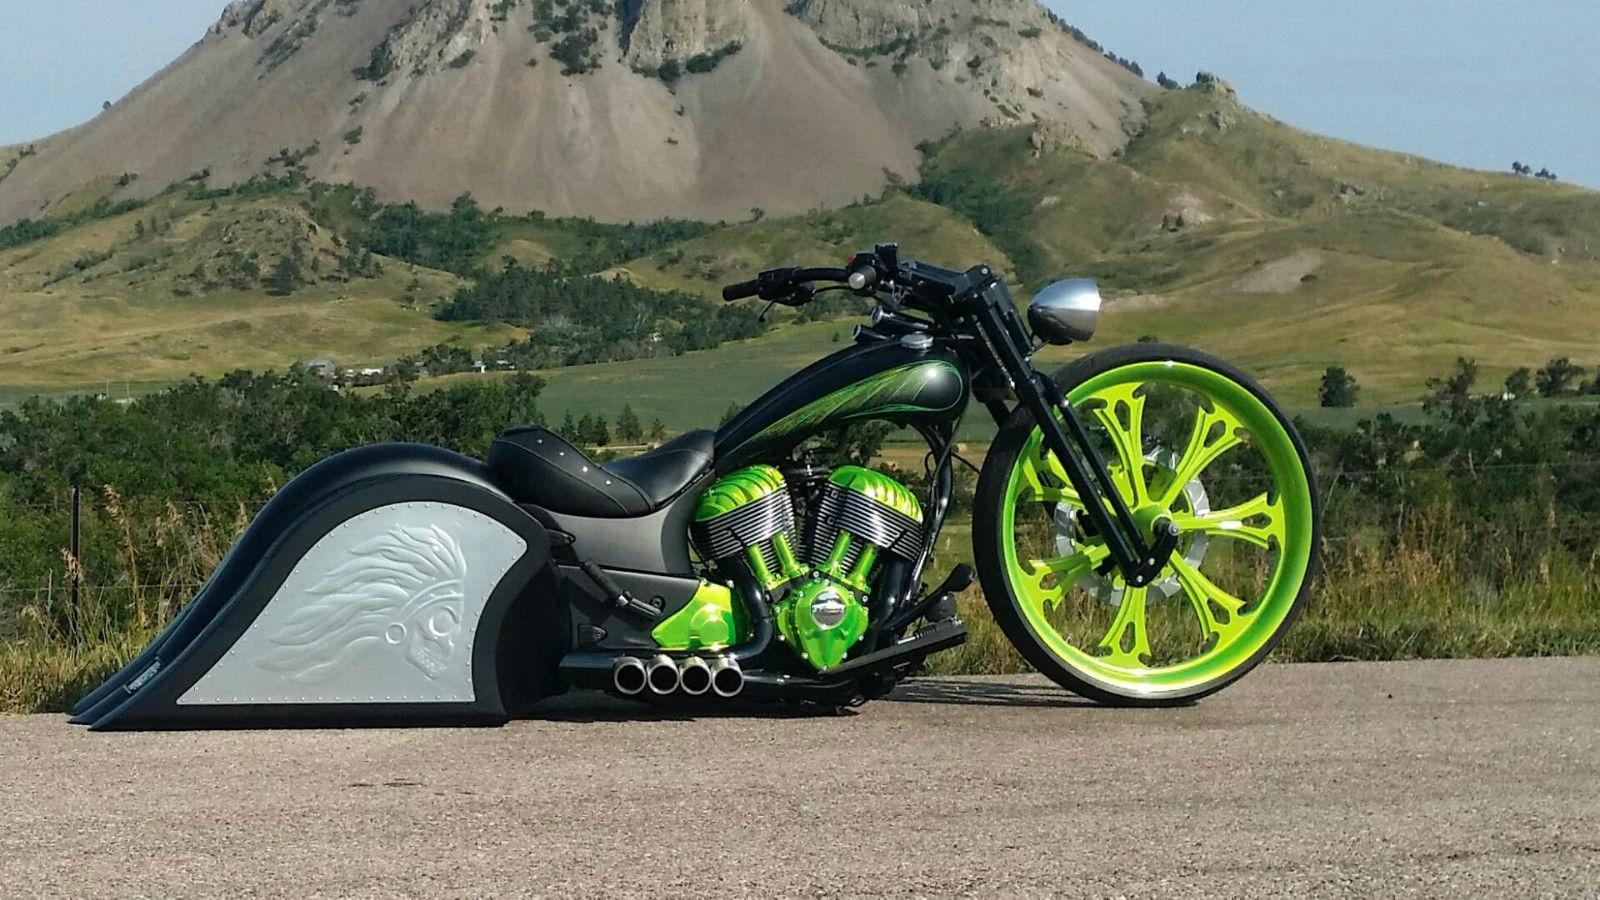 Gauge all american biker babes - 4 7